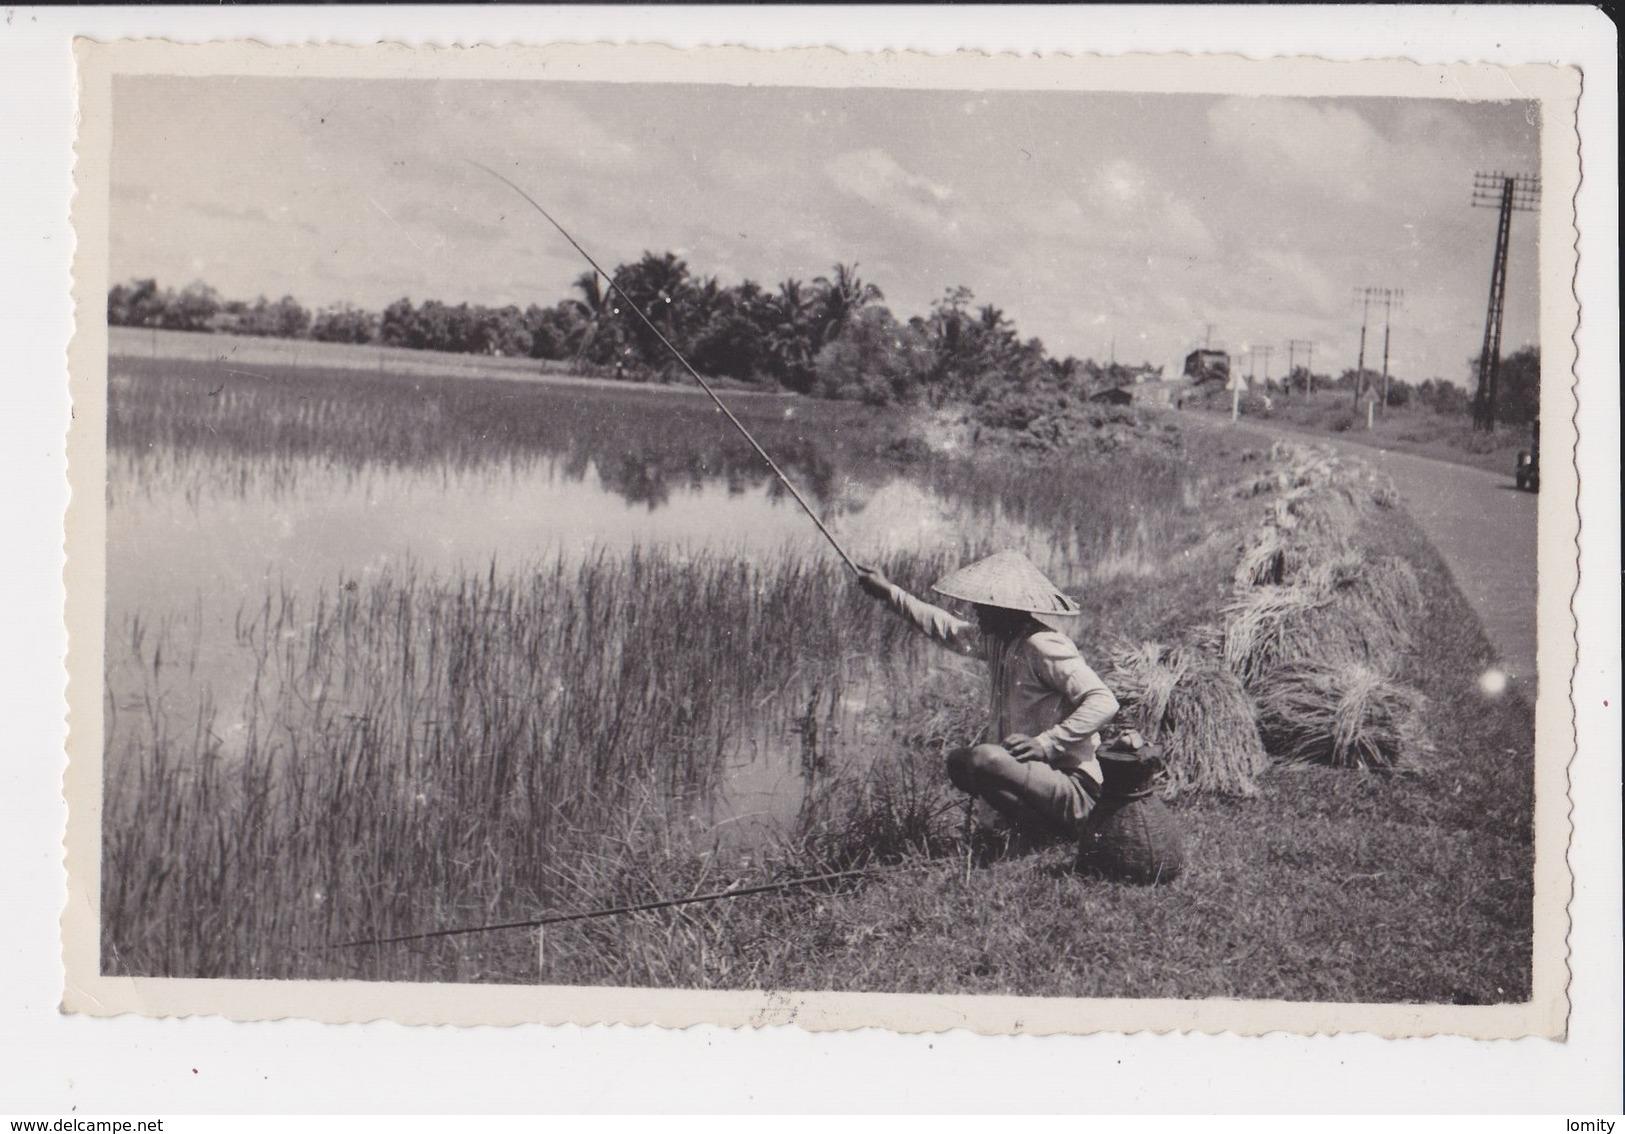 Viet Nam Vietnam Indochine CPSM PF Carte Photo + Timbre Cachet Saigon 1950 Pecheur Peche A Ligne - Viêt-Nam